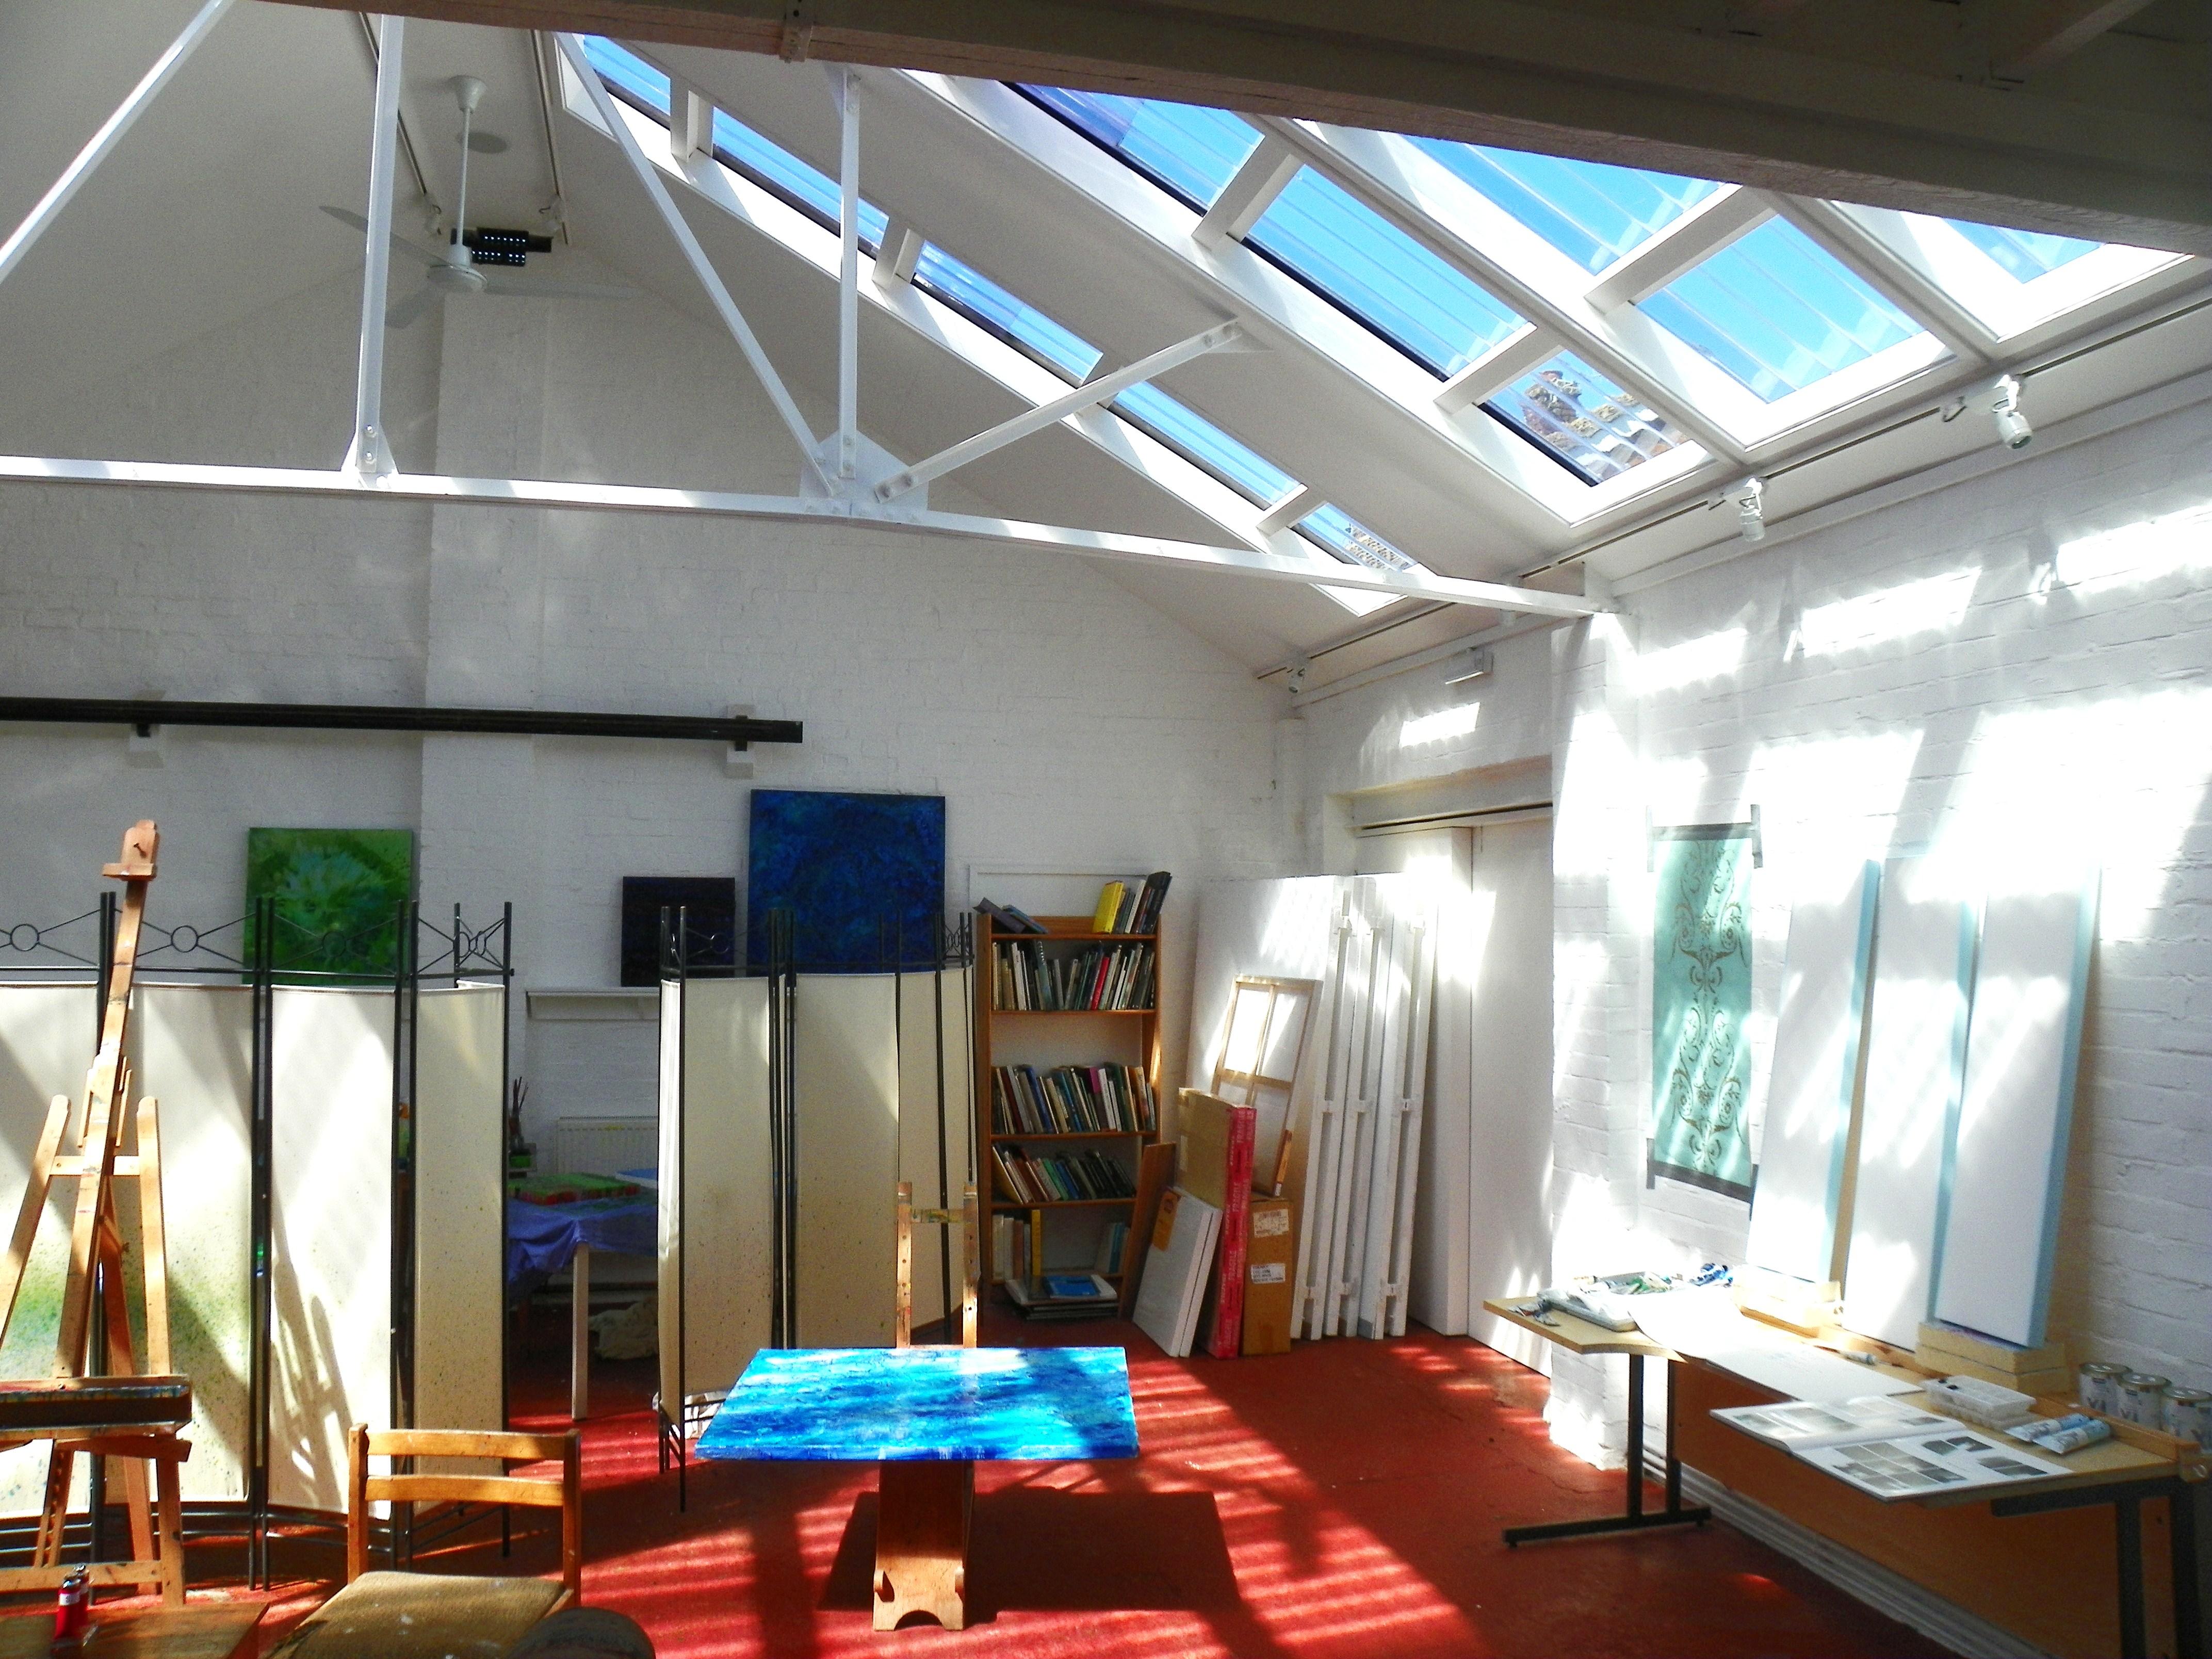 Pdf garage drawings uk plans diy free build wooden bench for Building garage plans free uk